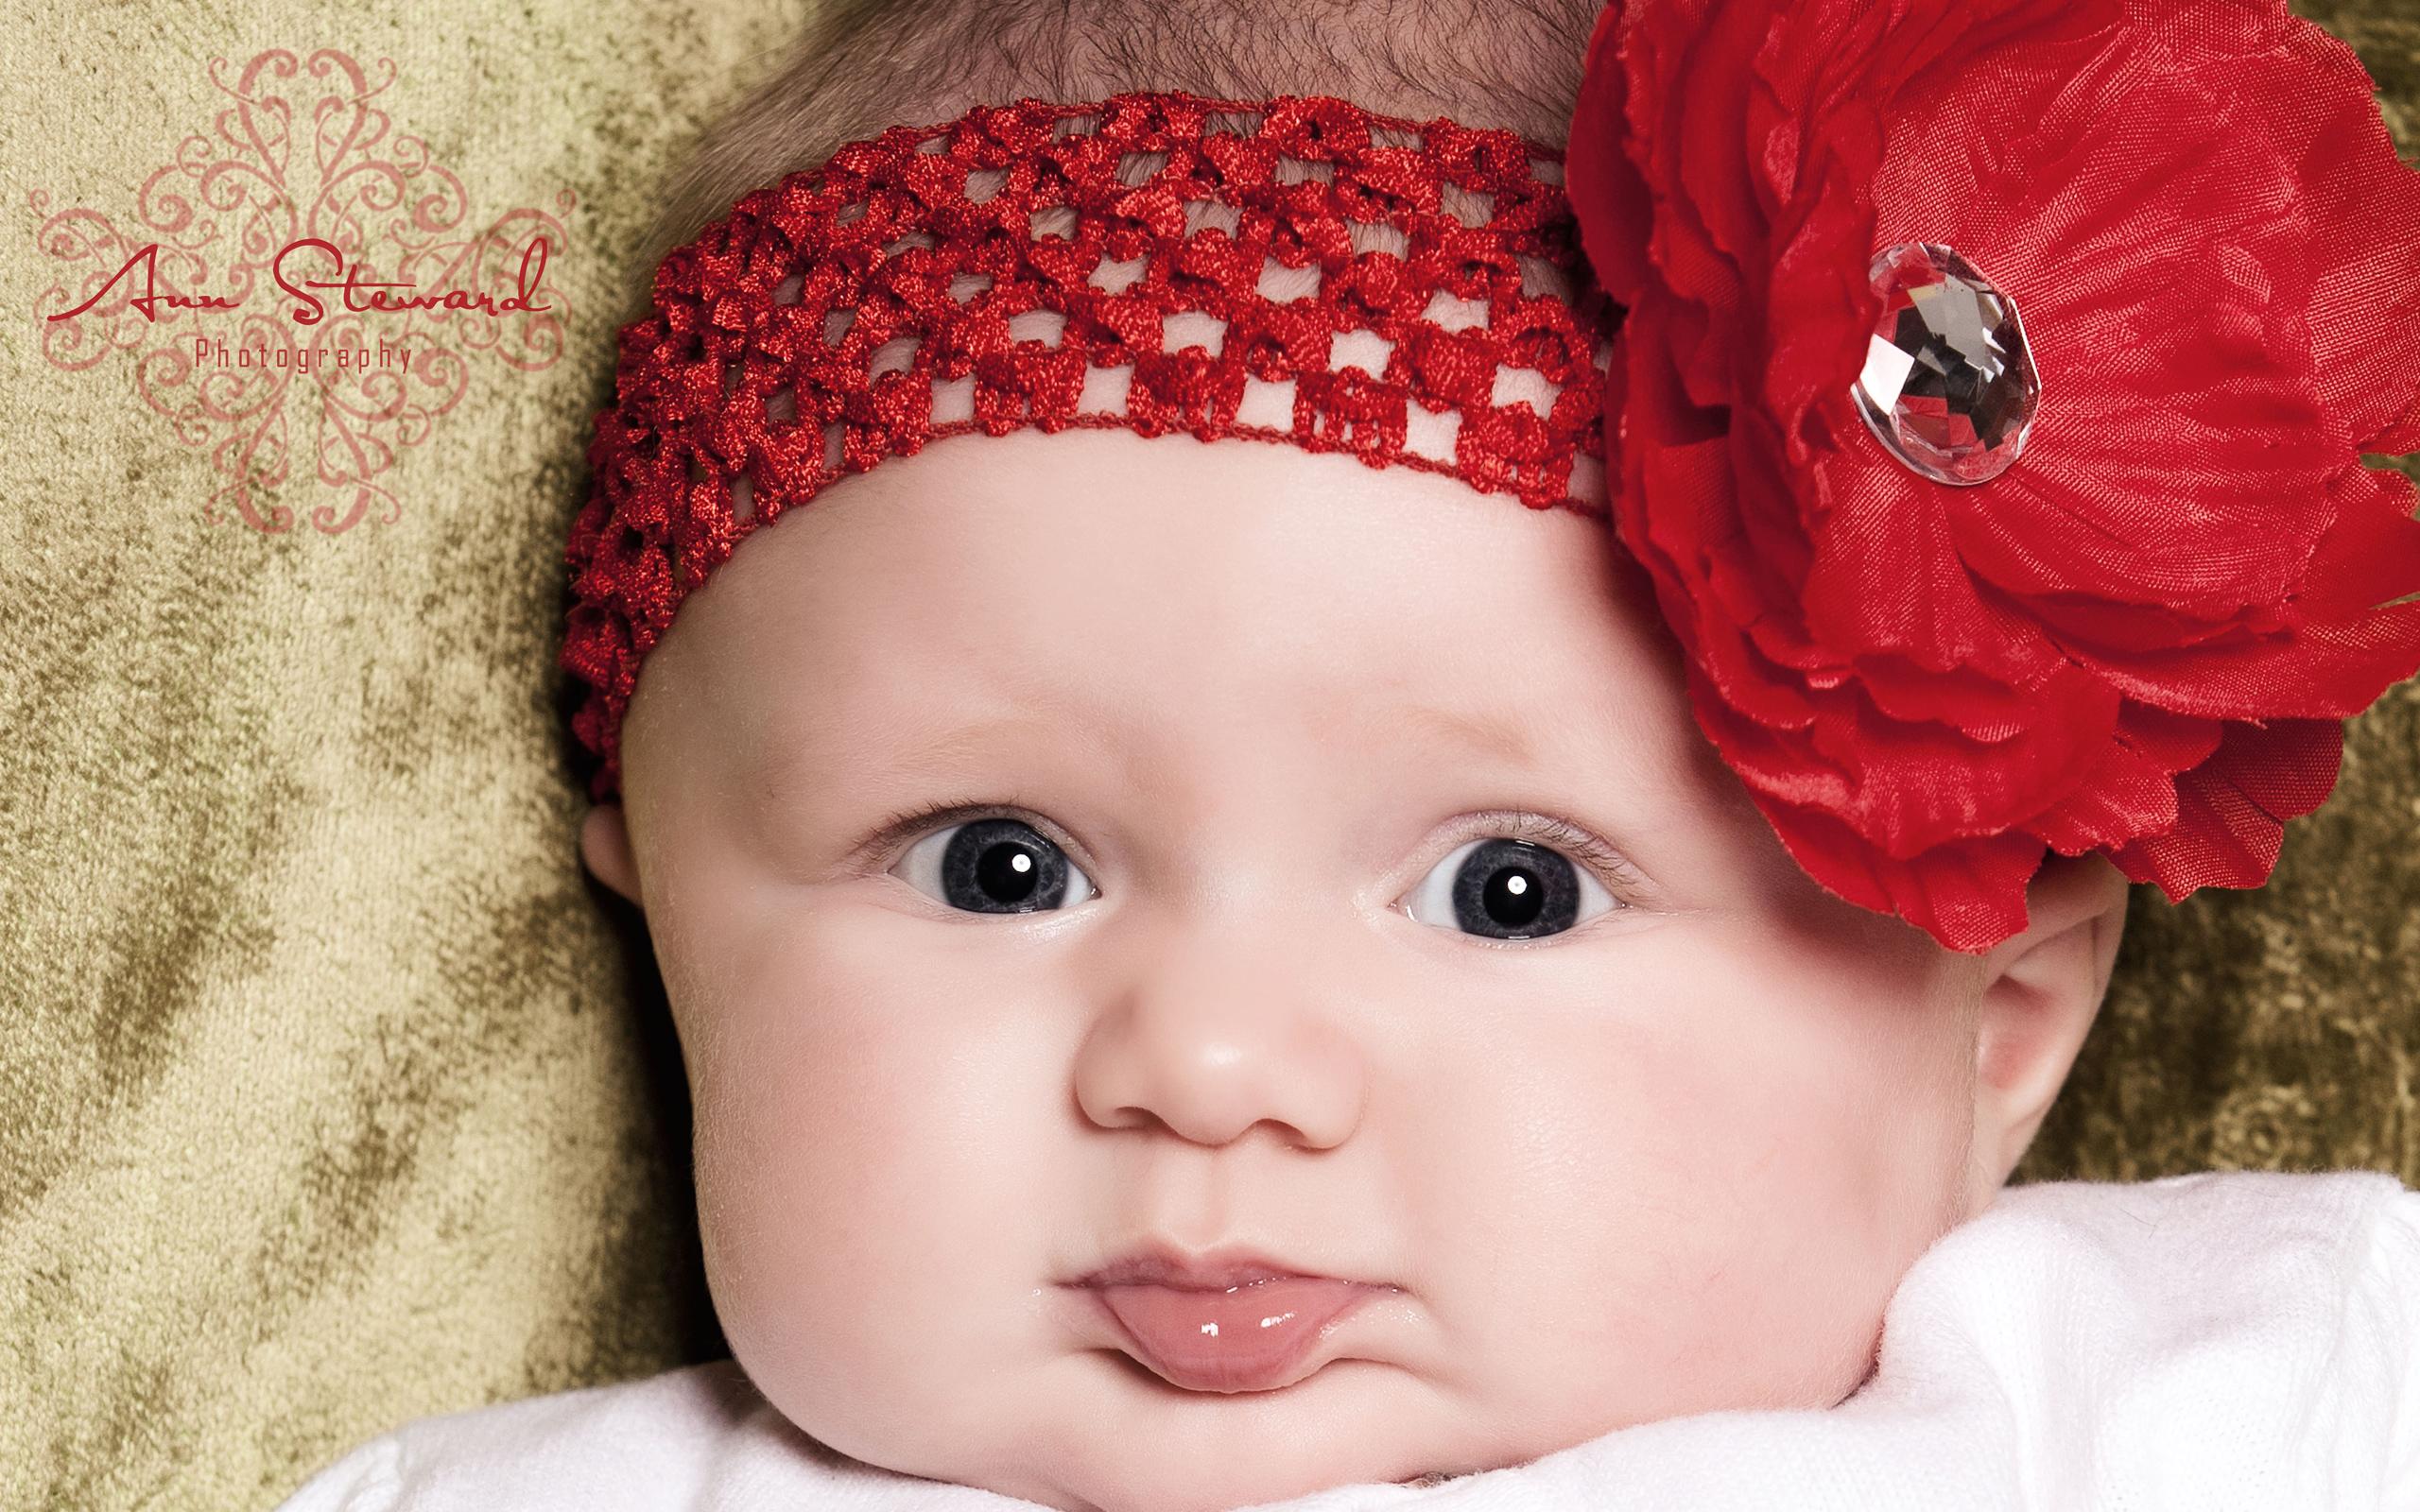 Wallpaper download of baby - Super Cute Little Baby Wallpapers Hd Wallpapers